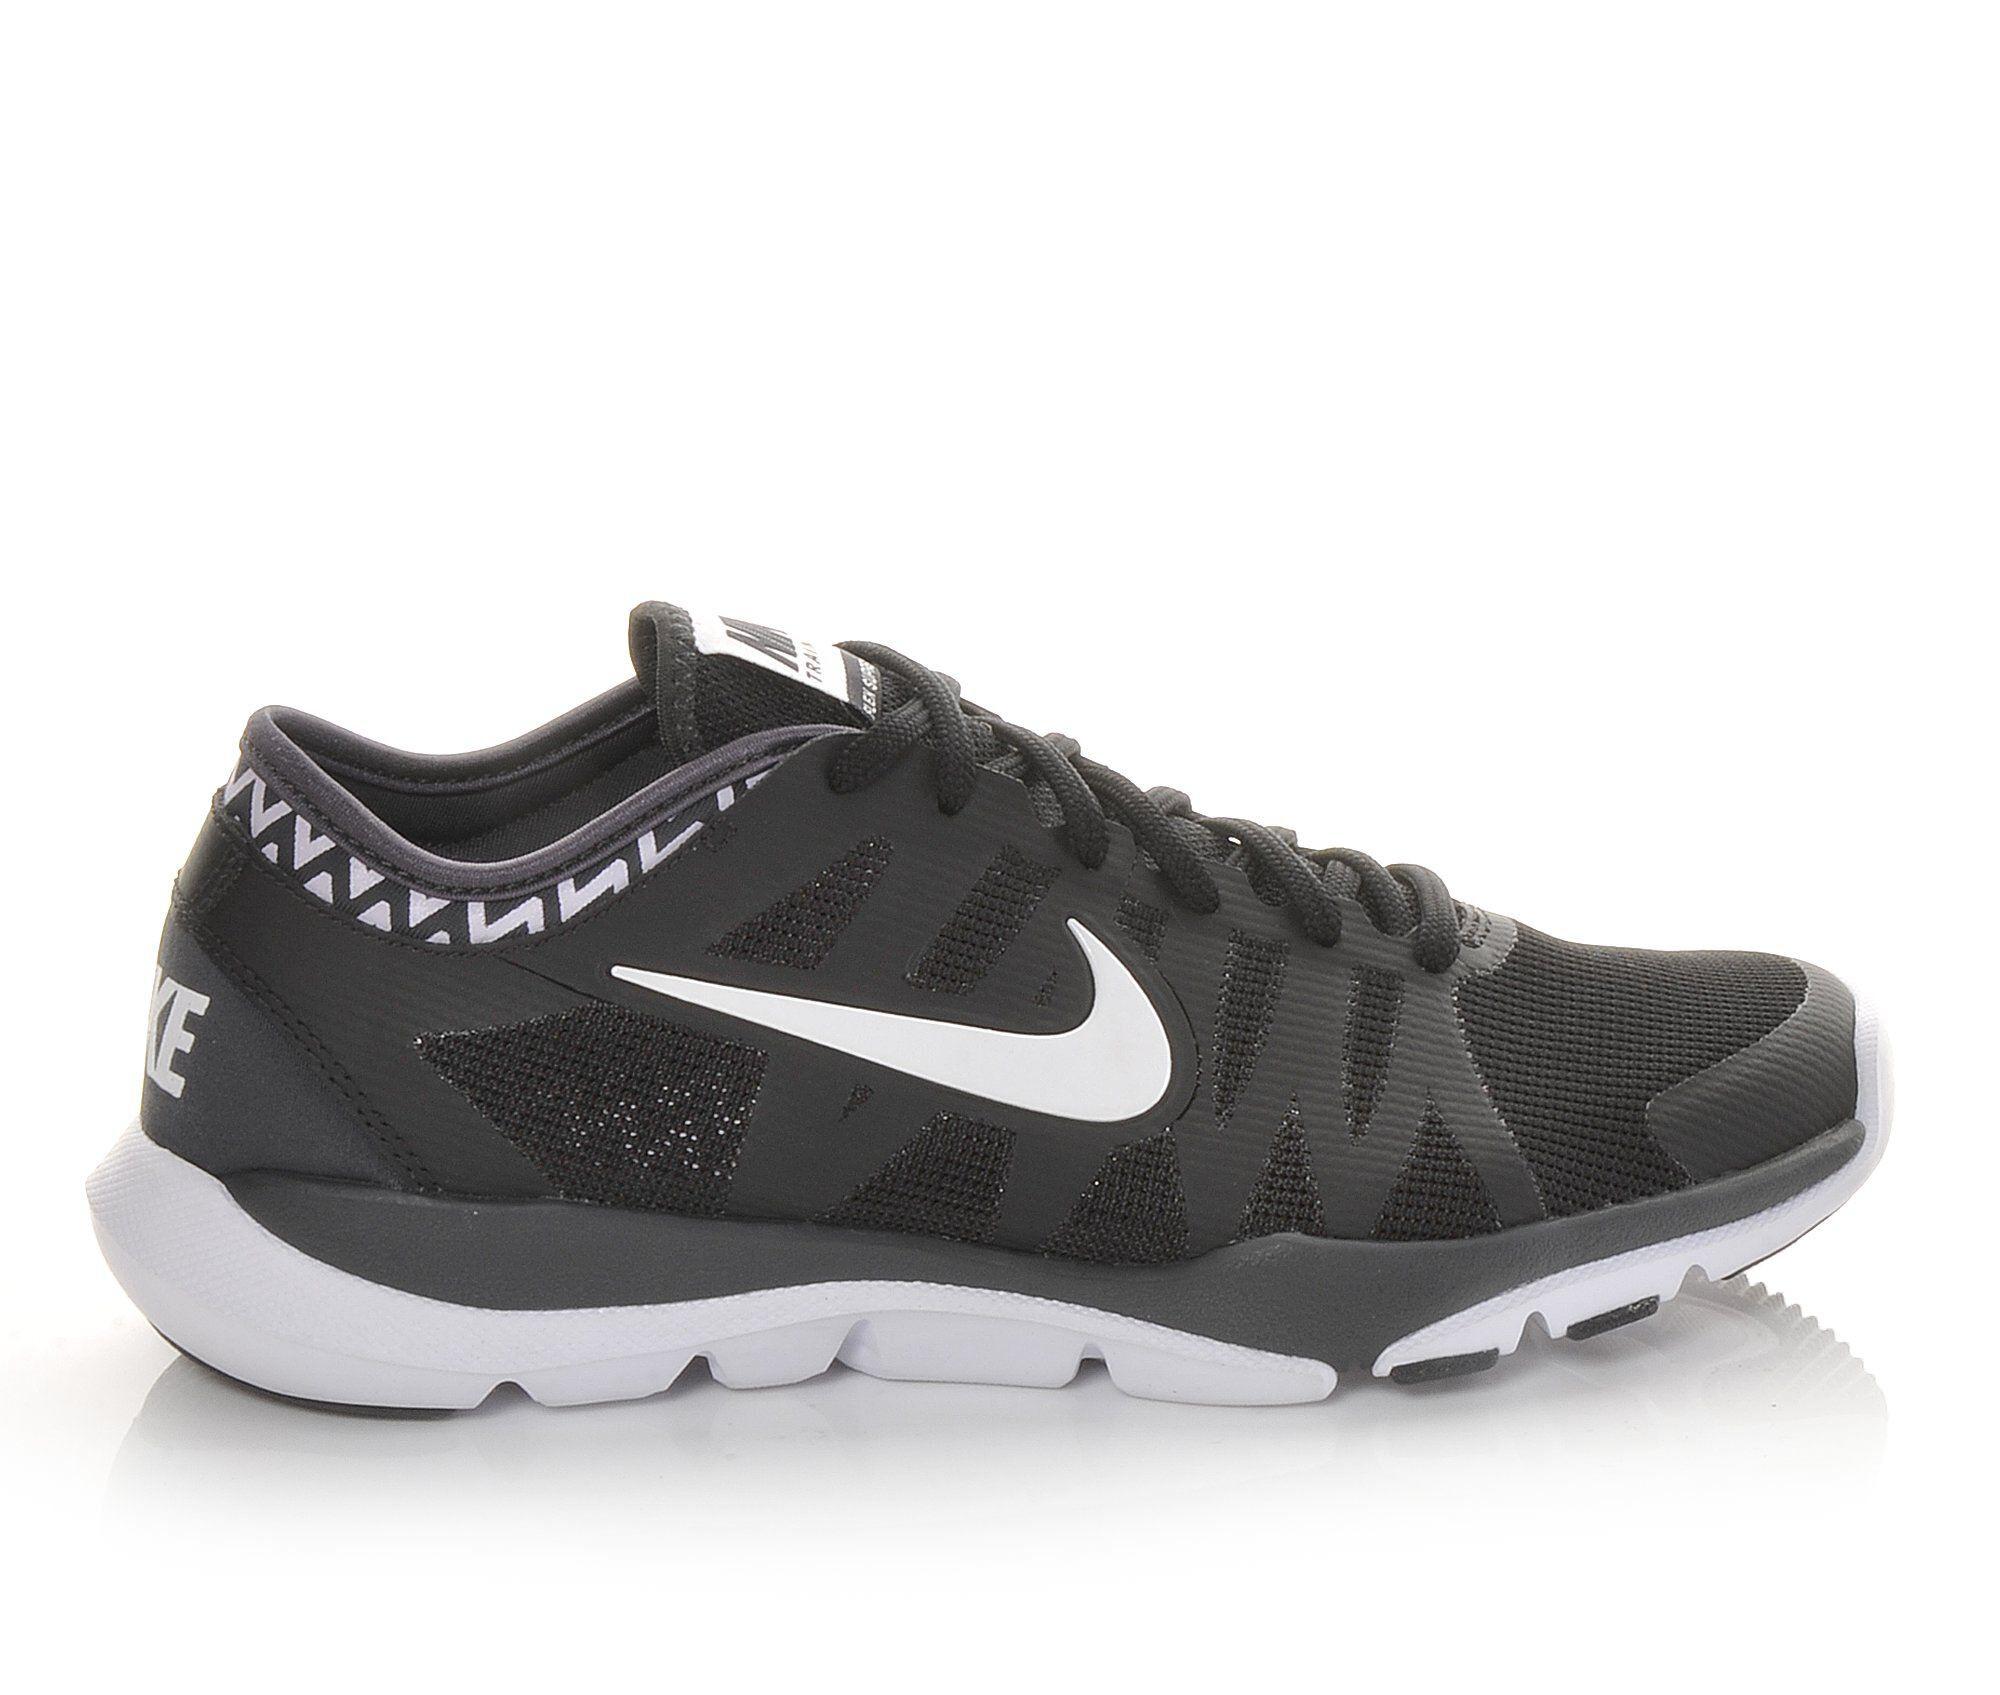 Images. Women's Nike Flex Supreme TR 3 Training Shoes